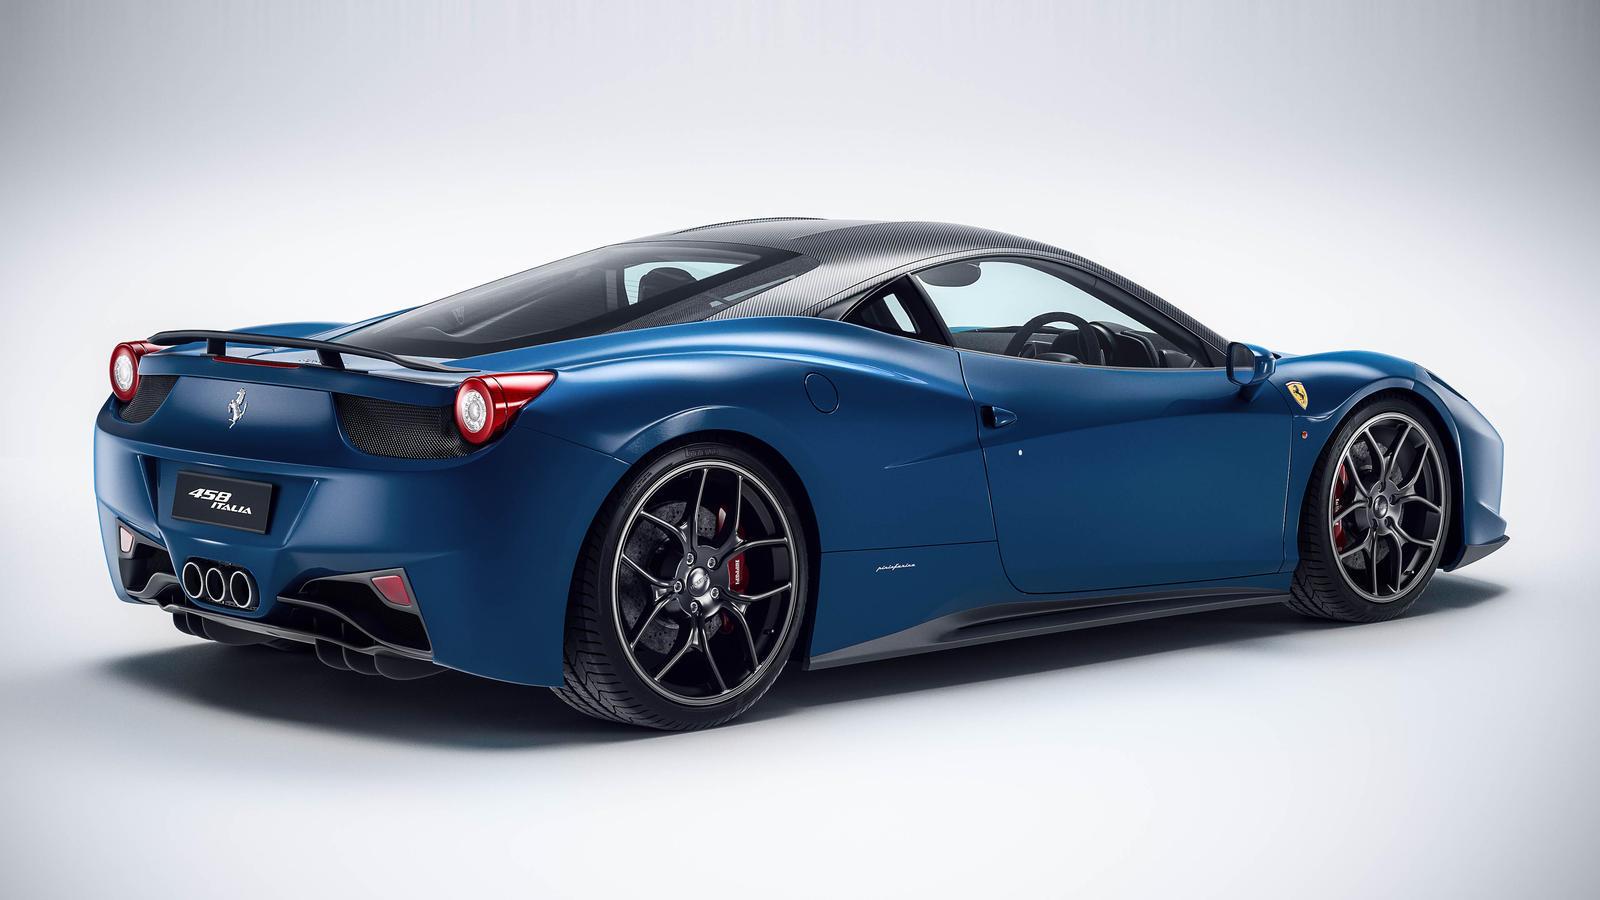 ferrari 458 blue ferrari 458italia novitecrosso - Ferrari 458 Blue Wallpaper